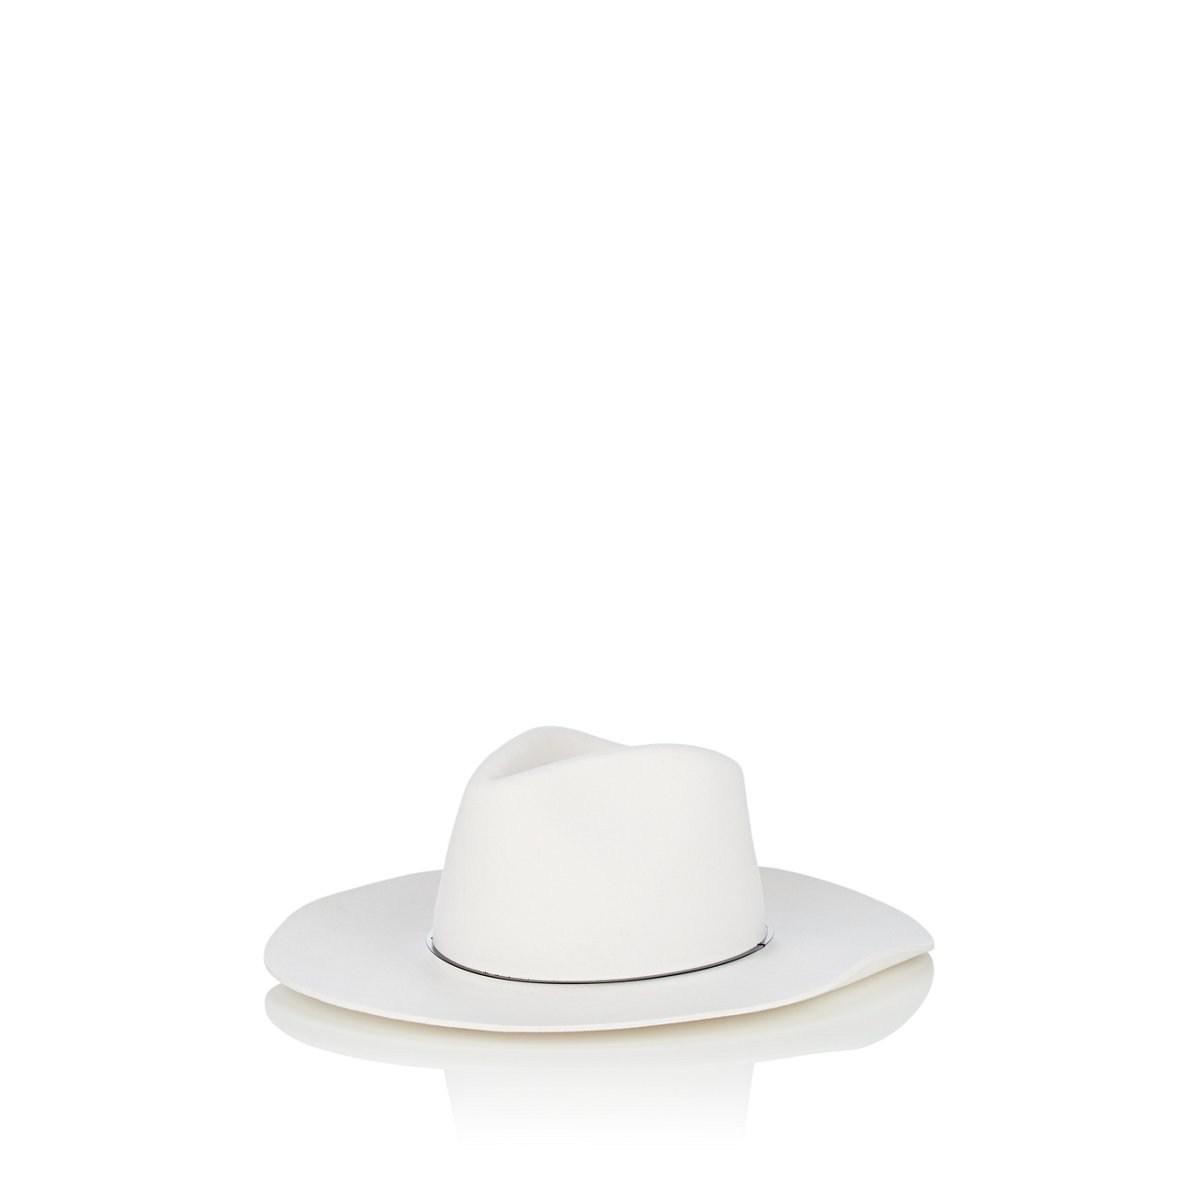 Janessa Leone Neil Wool Felt Fedora in White - Save 10% - Lyst 24478e959bf